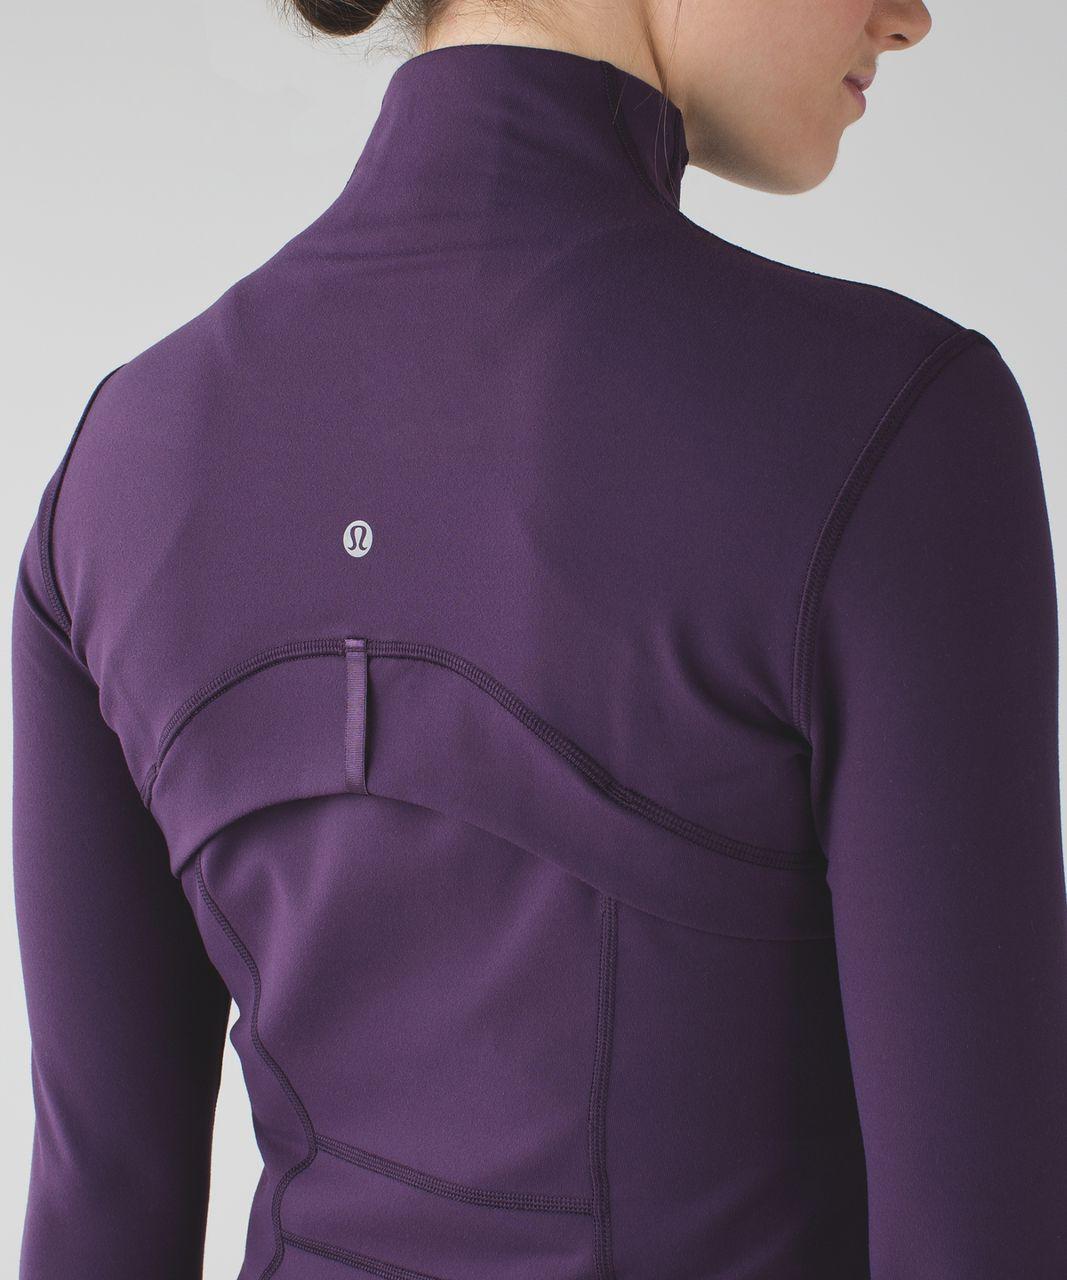 Lululemon Define Jacket - Deep Zinfandel